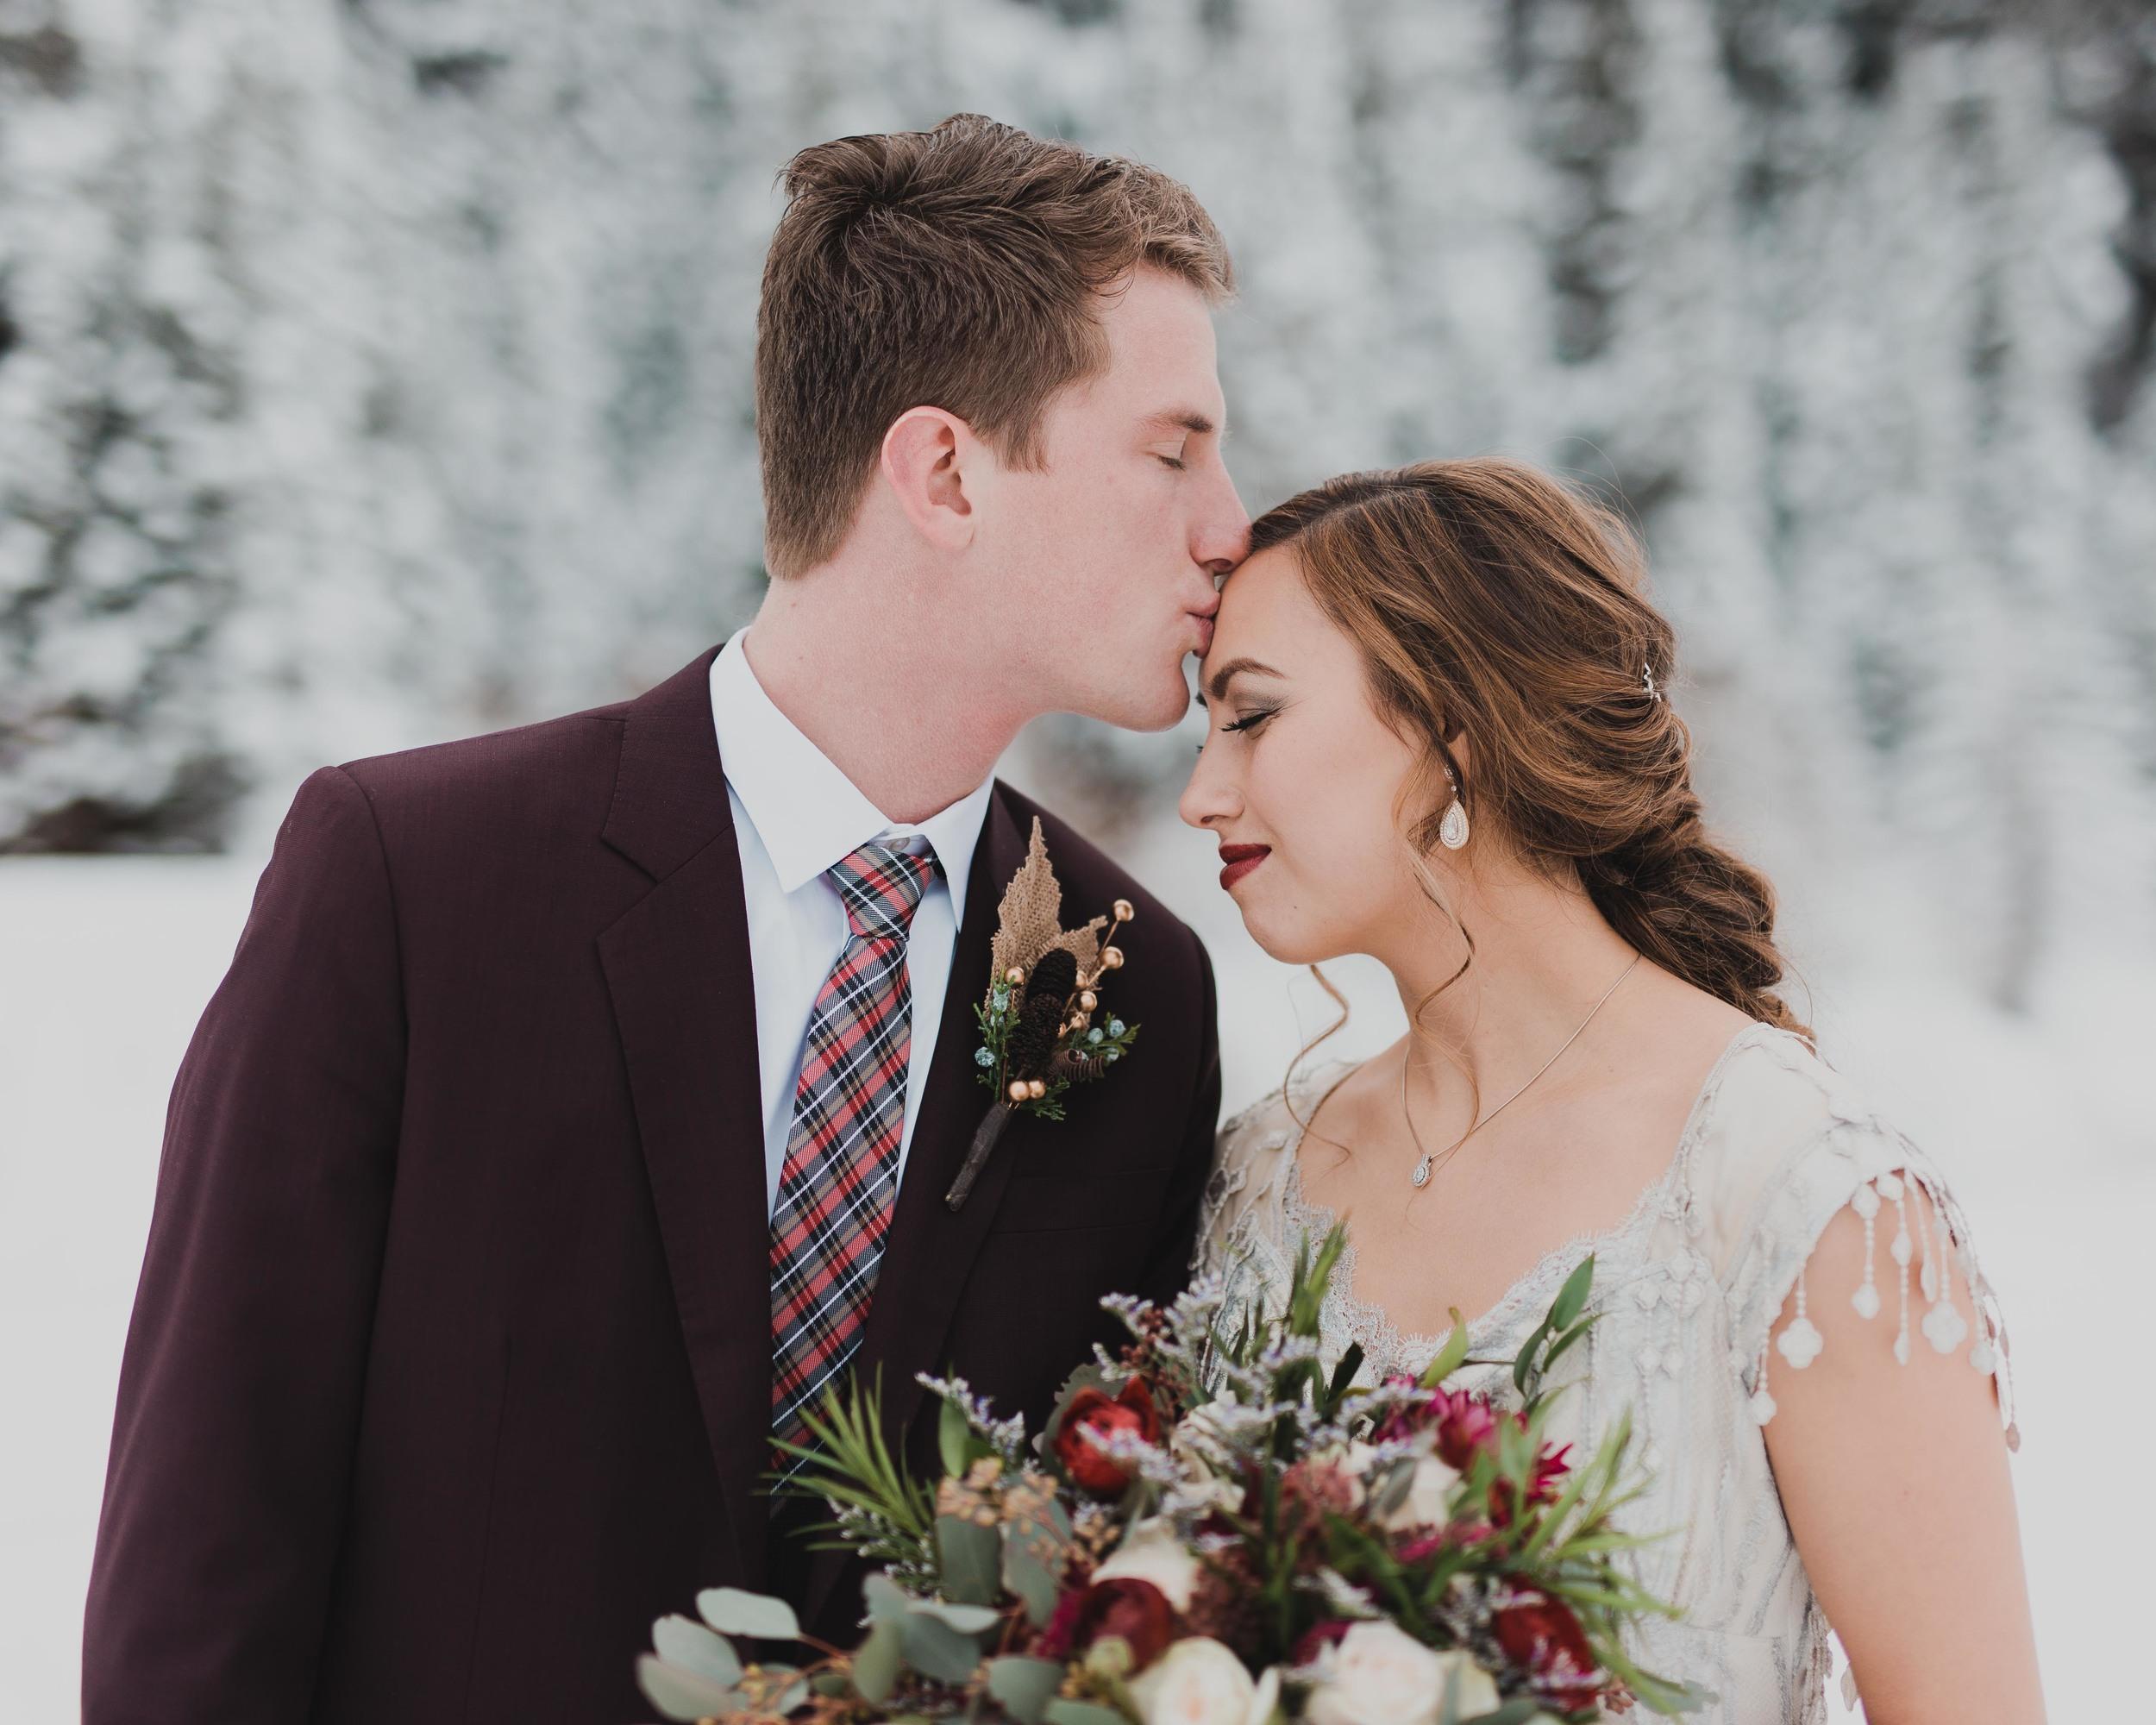 Salt-Lake-City-Utah-Wedding-Photographer-8.jpg